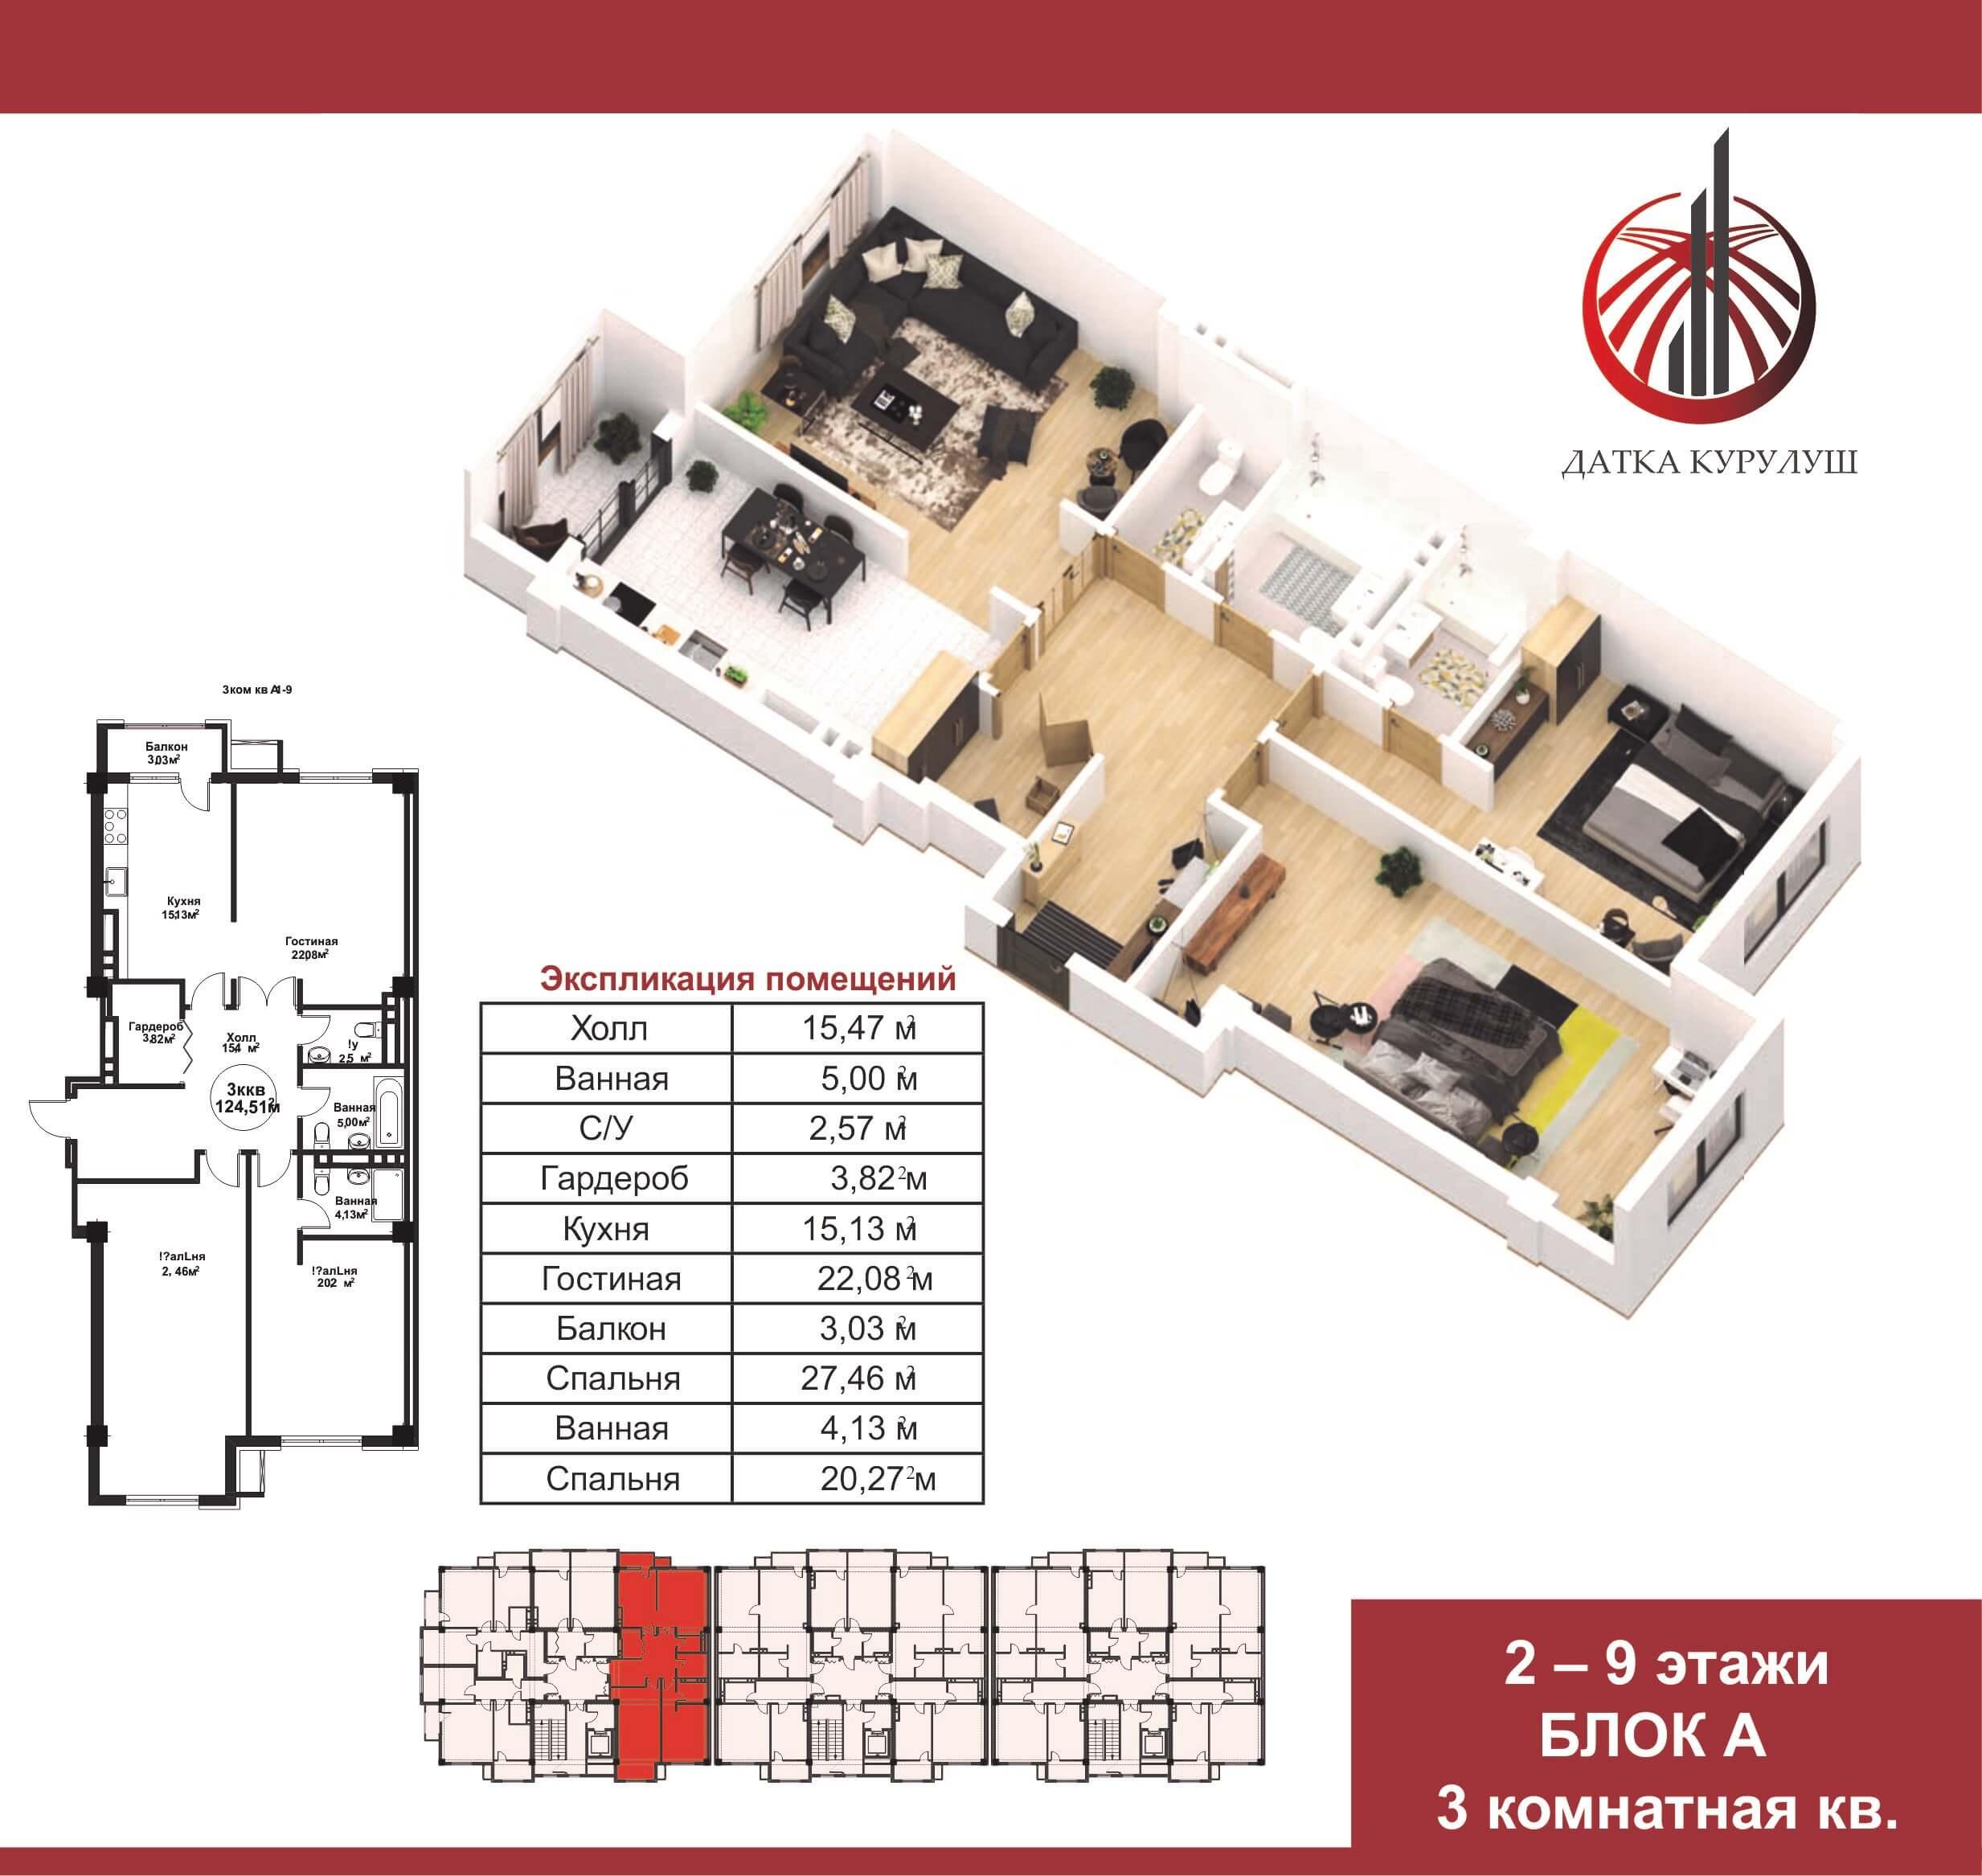 3-х комнатная квартира 124,51 кв.м.